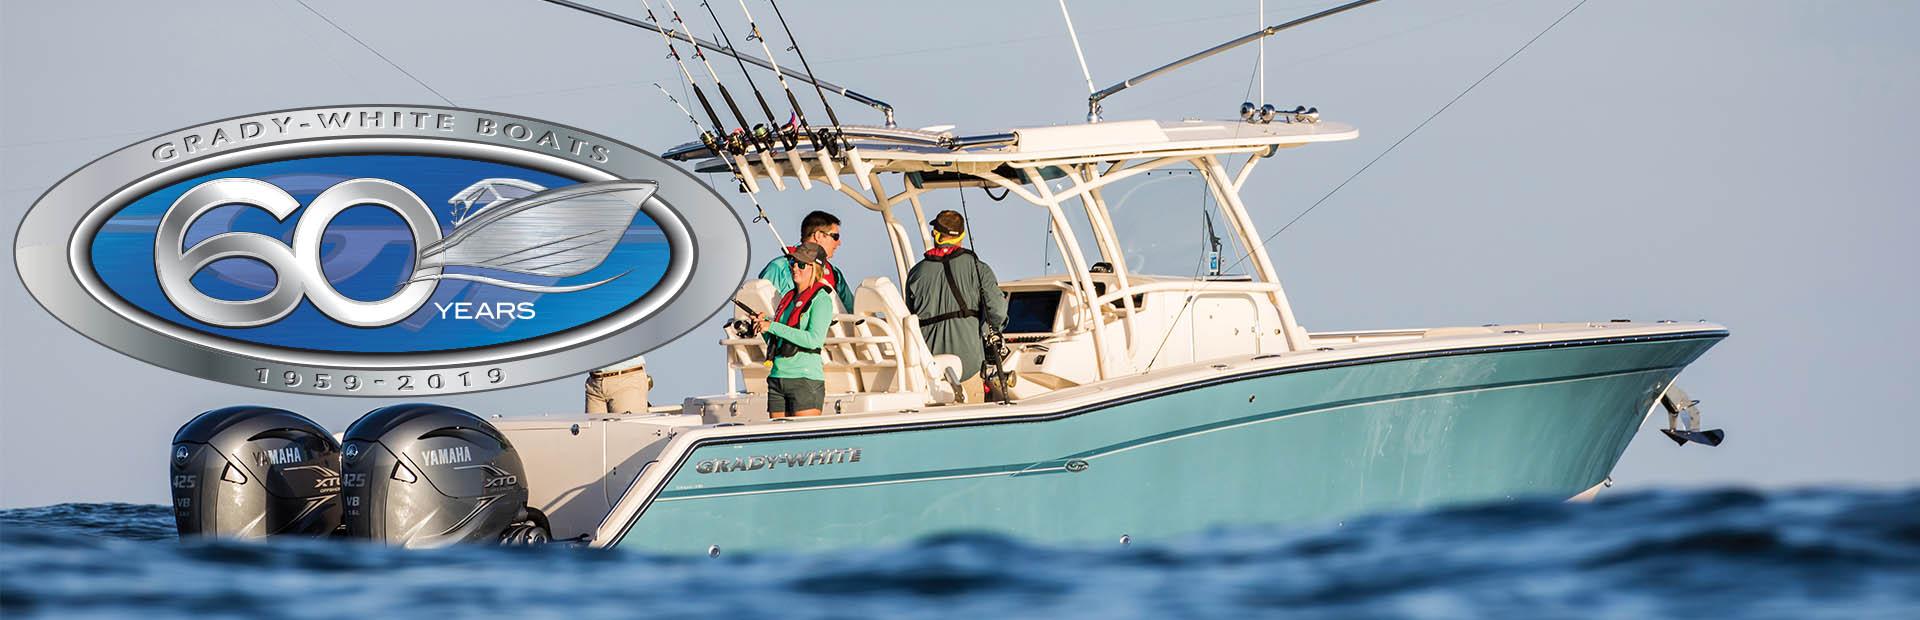 Home Caribee Boat Sales Islamorada Fl 305 664 3431 White Suzuki Outboards Gradywhite